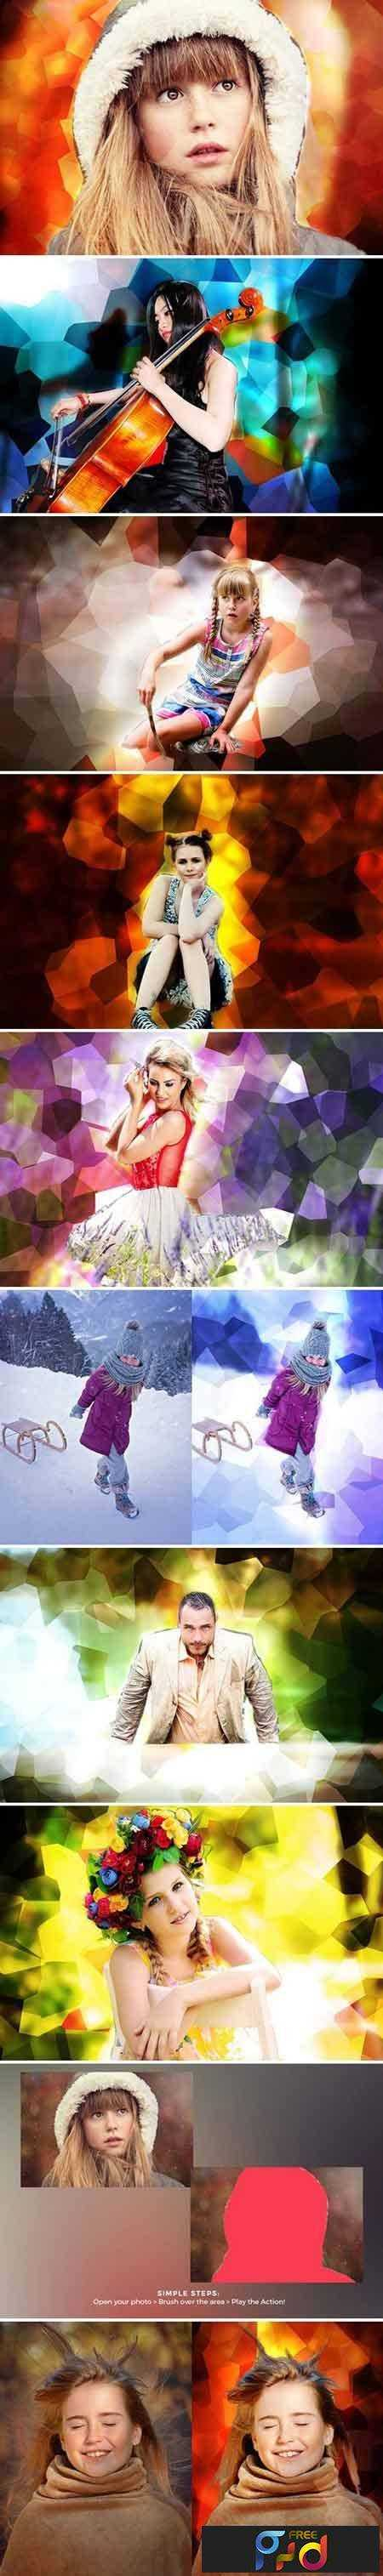 1709102 Krystal Photoshop Action 2104263 1